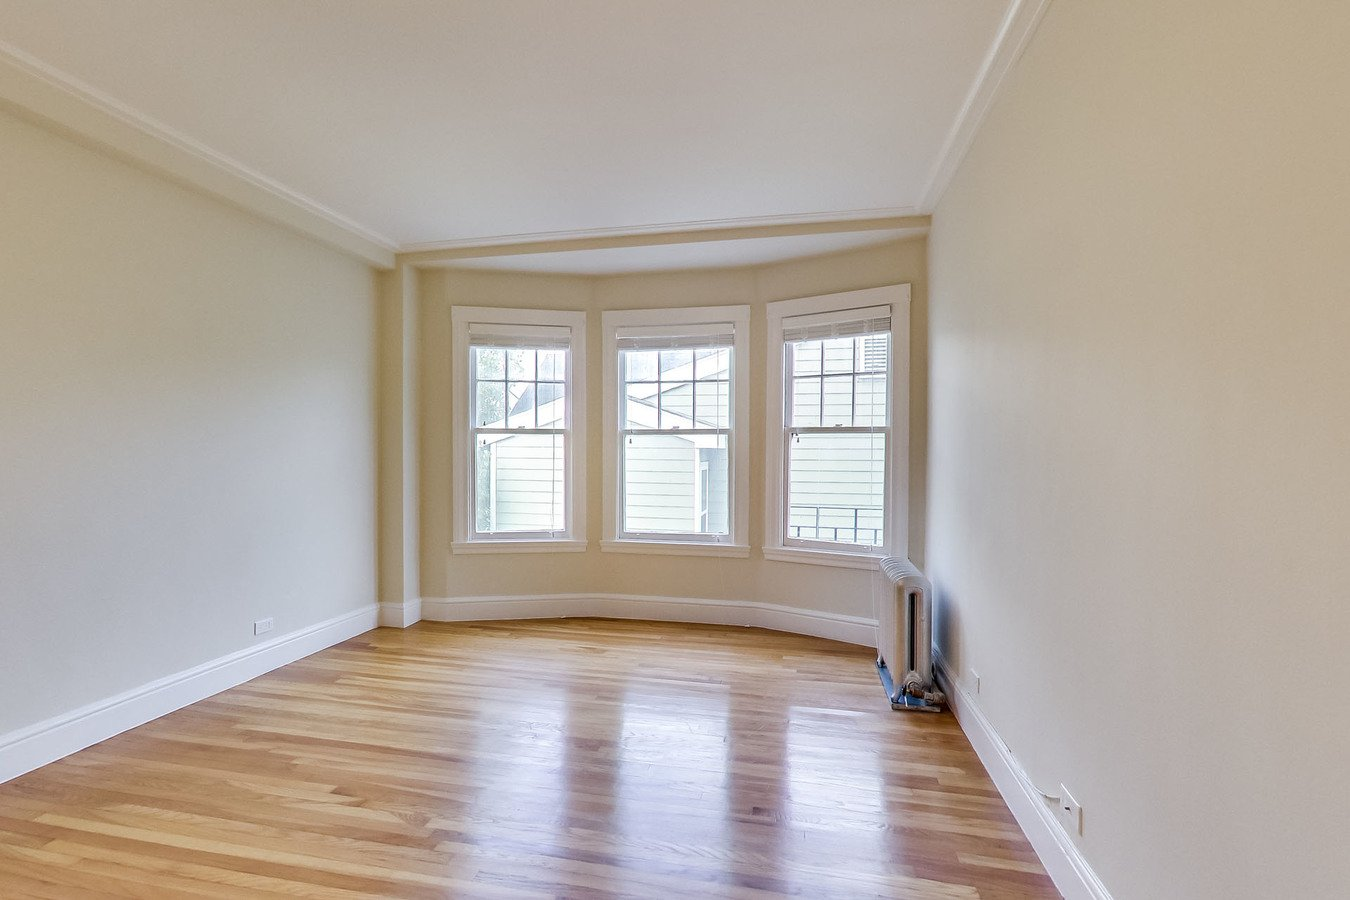 1 Bedroom 1 Bathroom Apartment for rent at 990 FULTON Apartments in San Francisco, CA